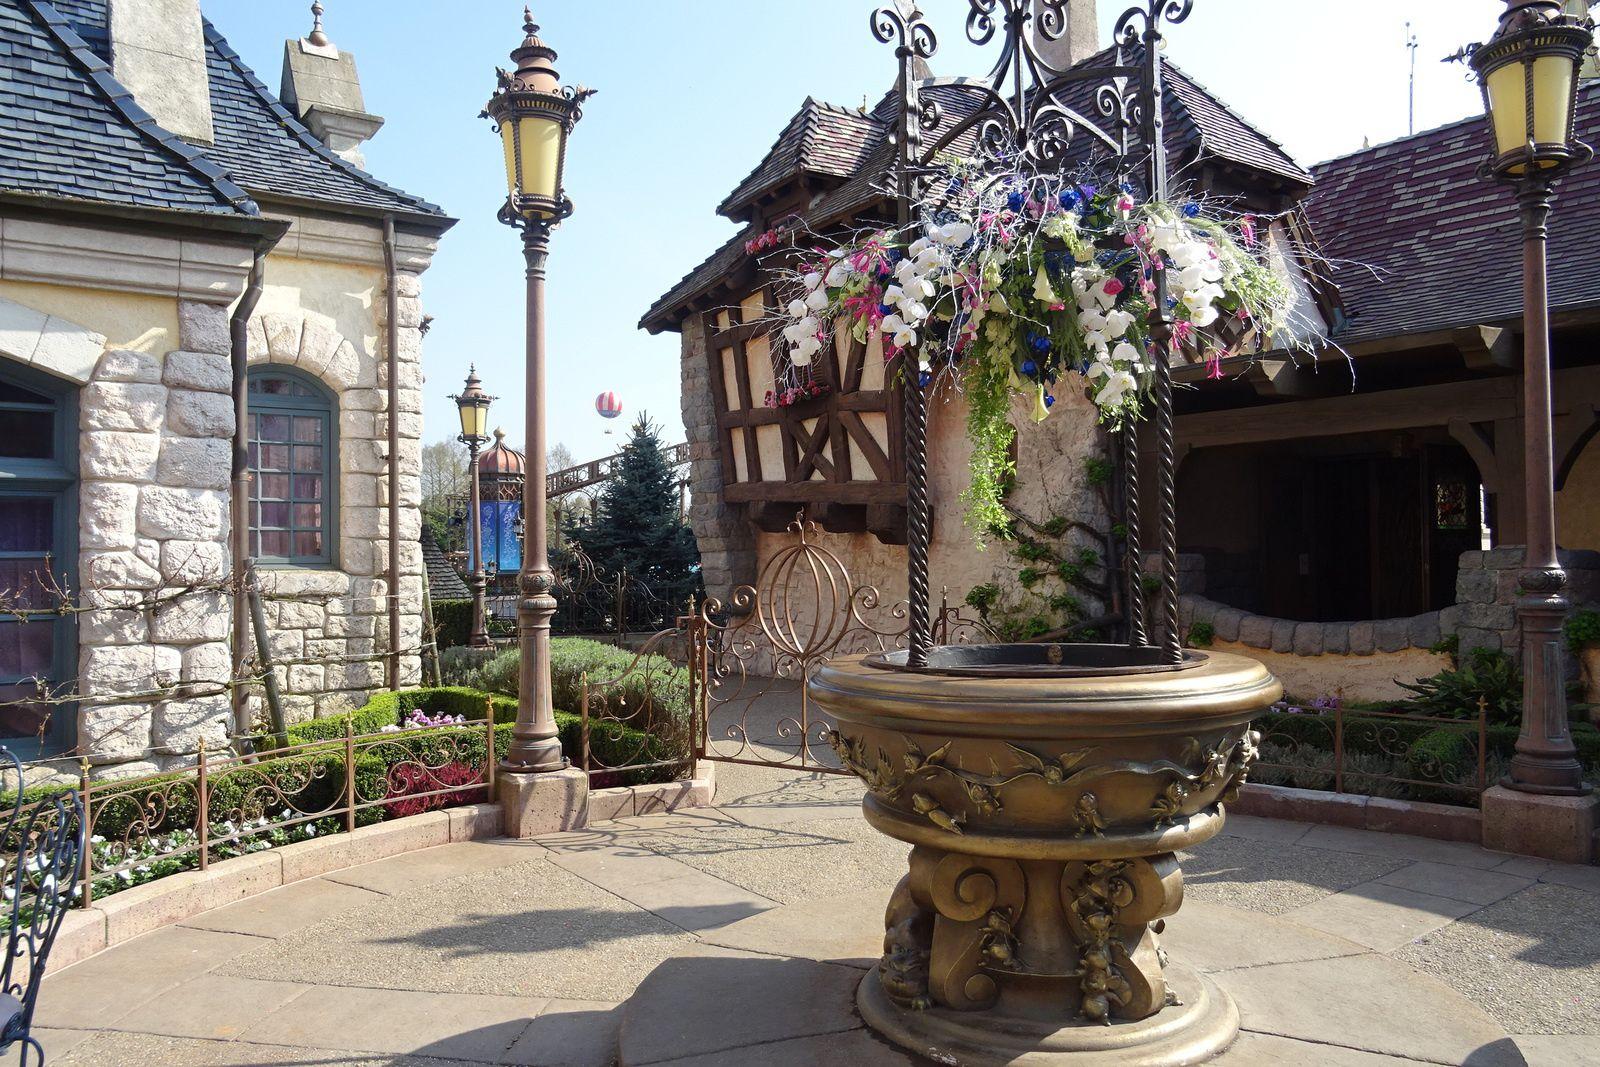 Les cadenas d'amour de Disneyland Paris